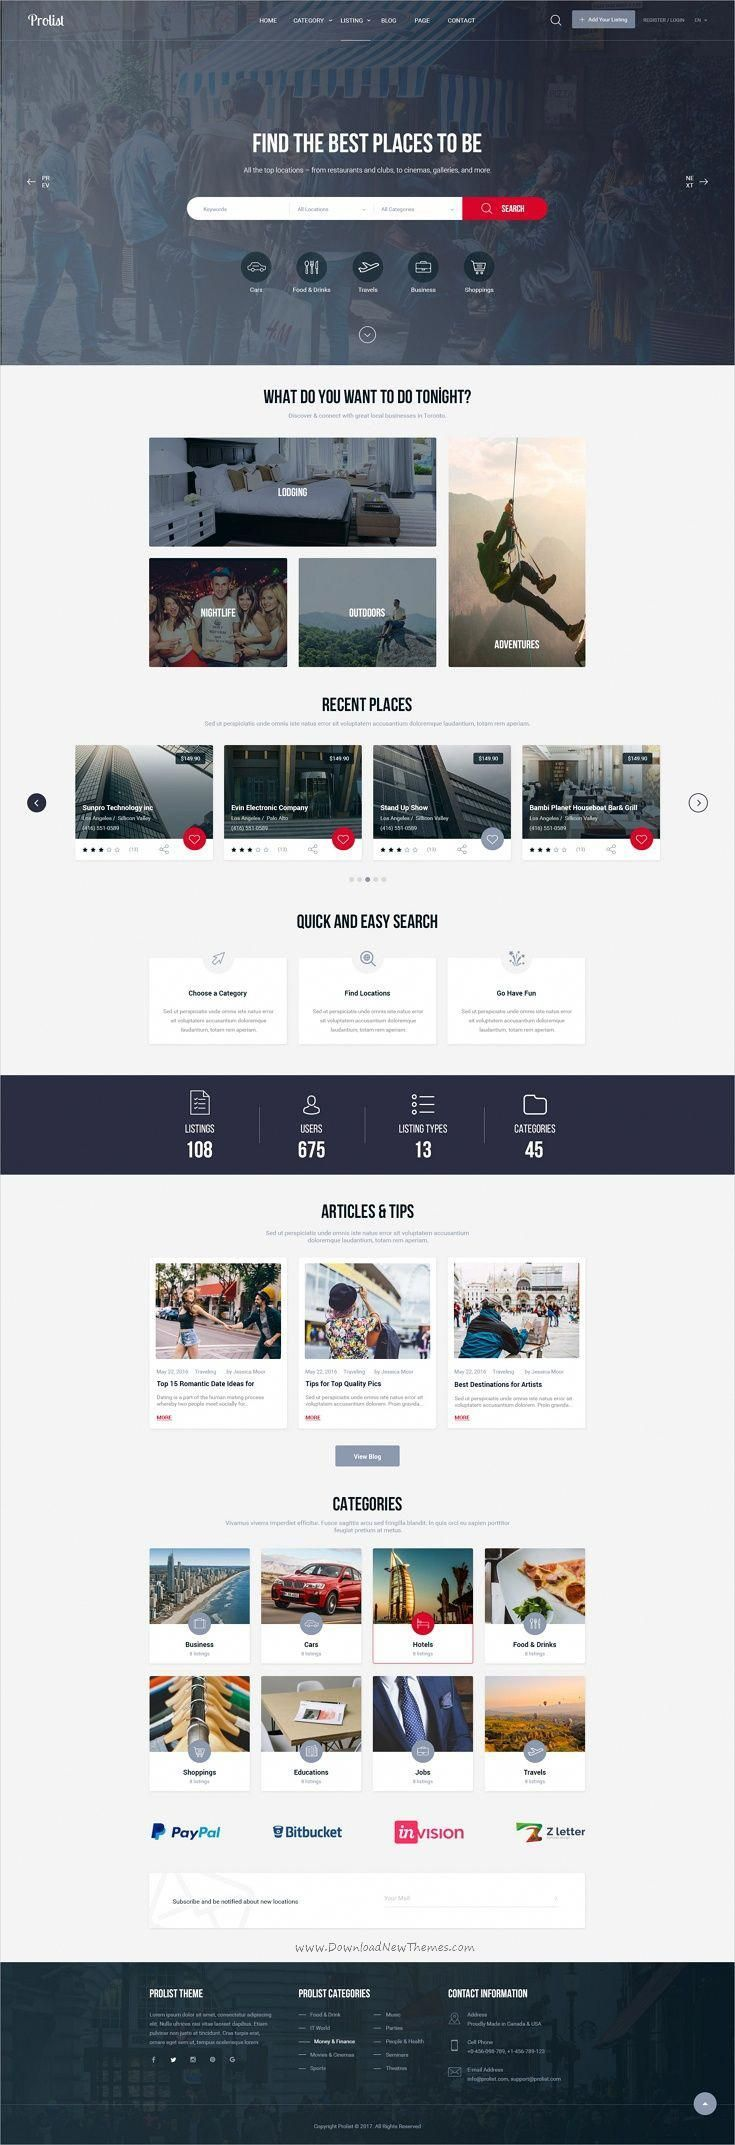 Tips And Tricks To Great Website Design Web Design Tips Web Design Tips Web Layout Design Online Web Design